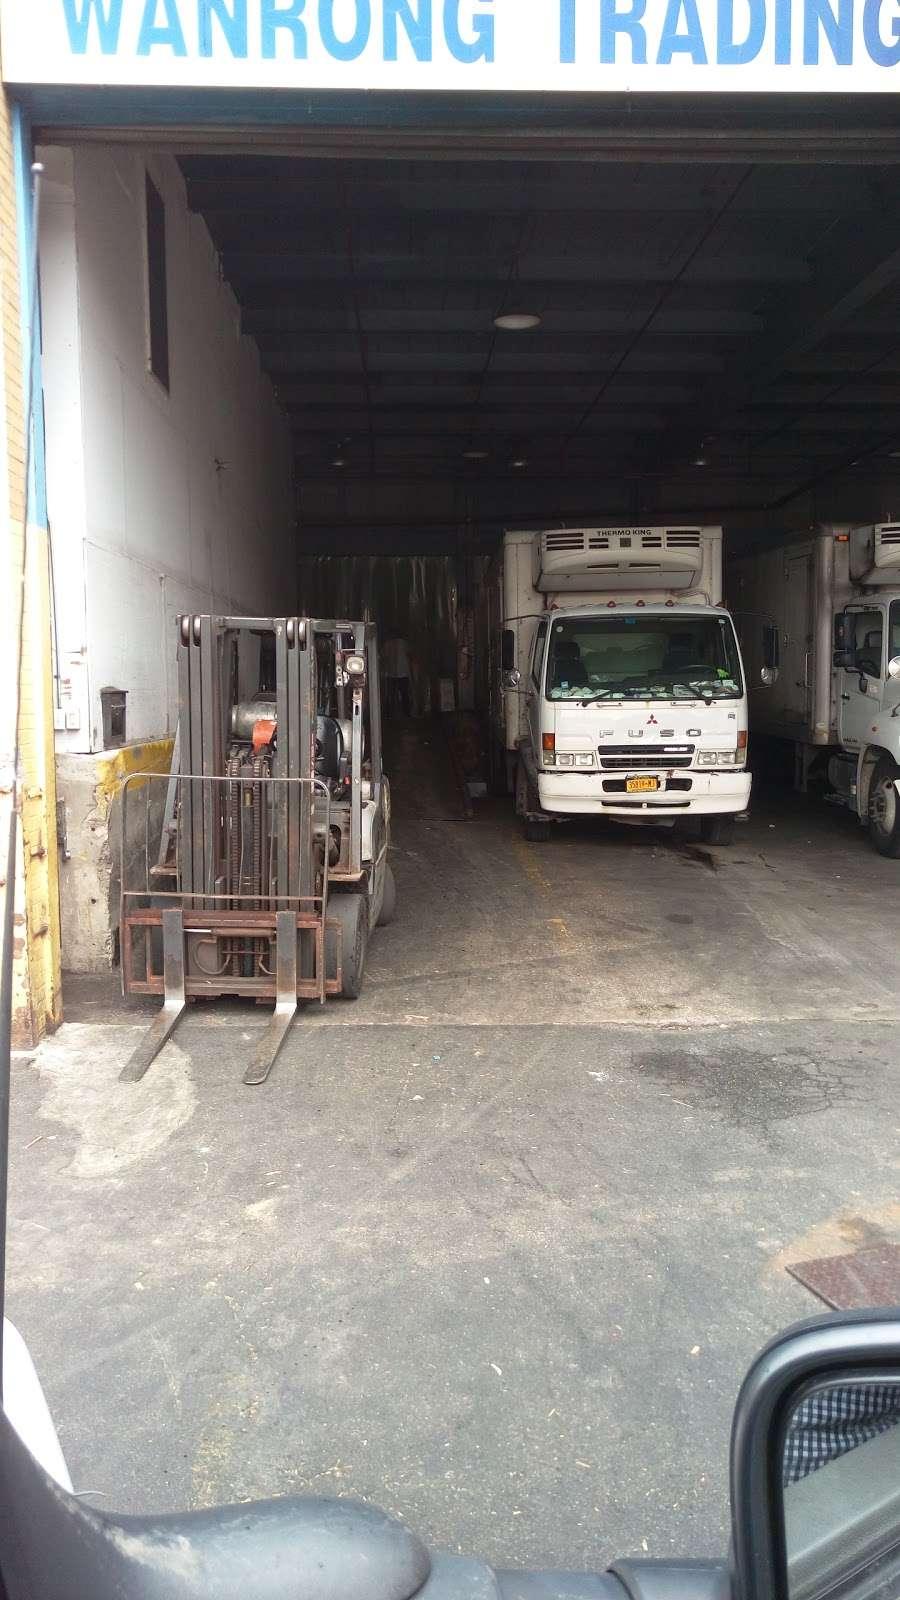 Wanrong Trading Truck Docks - storage  | Photo 2 of 10 | Address: 32-27-, 32-45 Hunters Point Ave, Long Island City, NY 11101, USA | Phone: (718) 361-8882